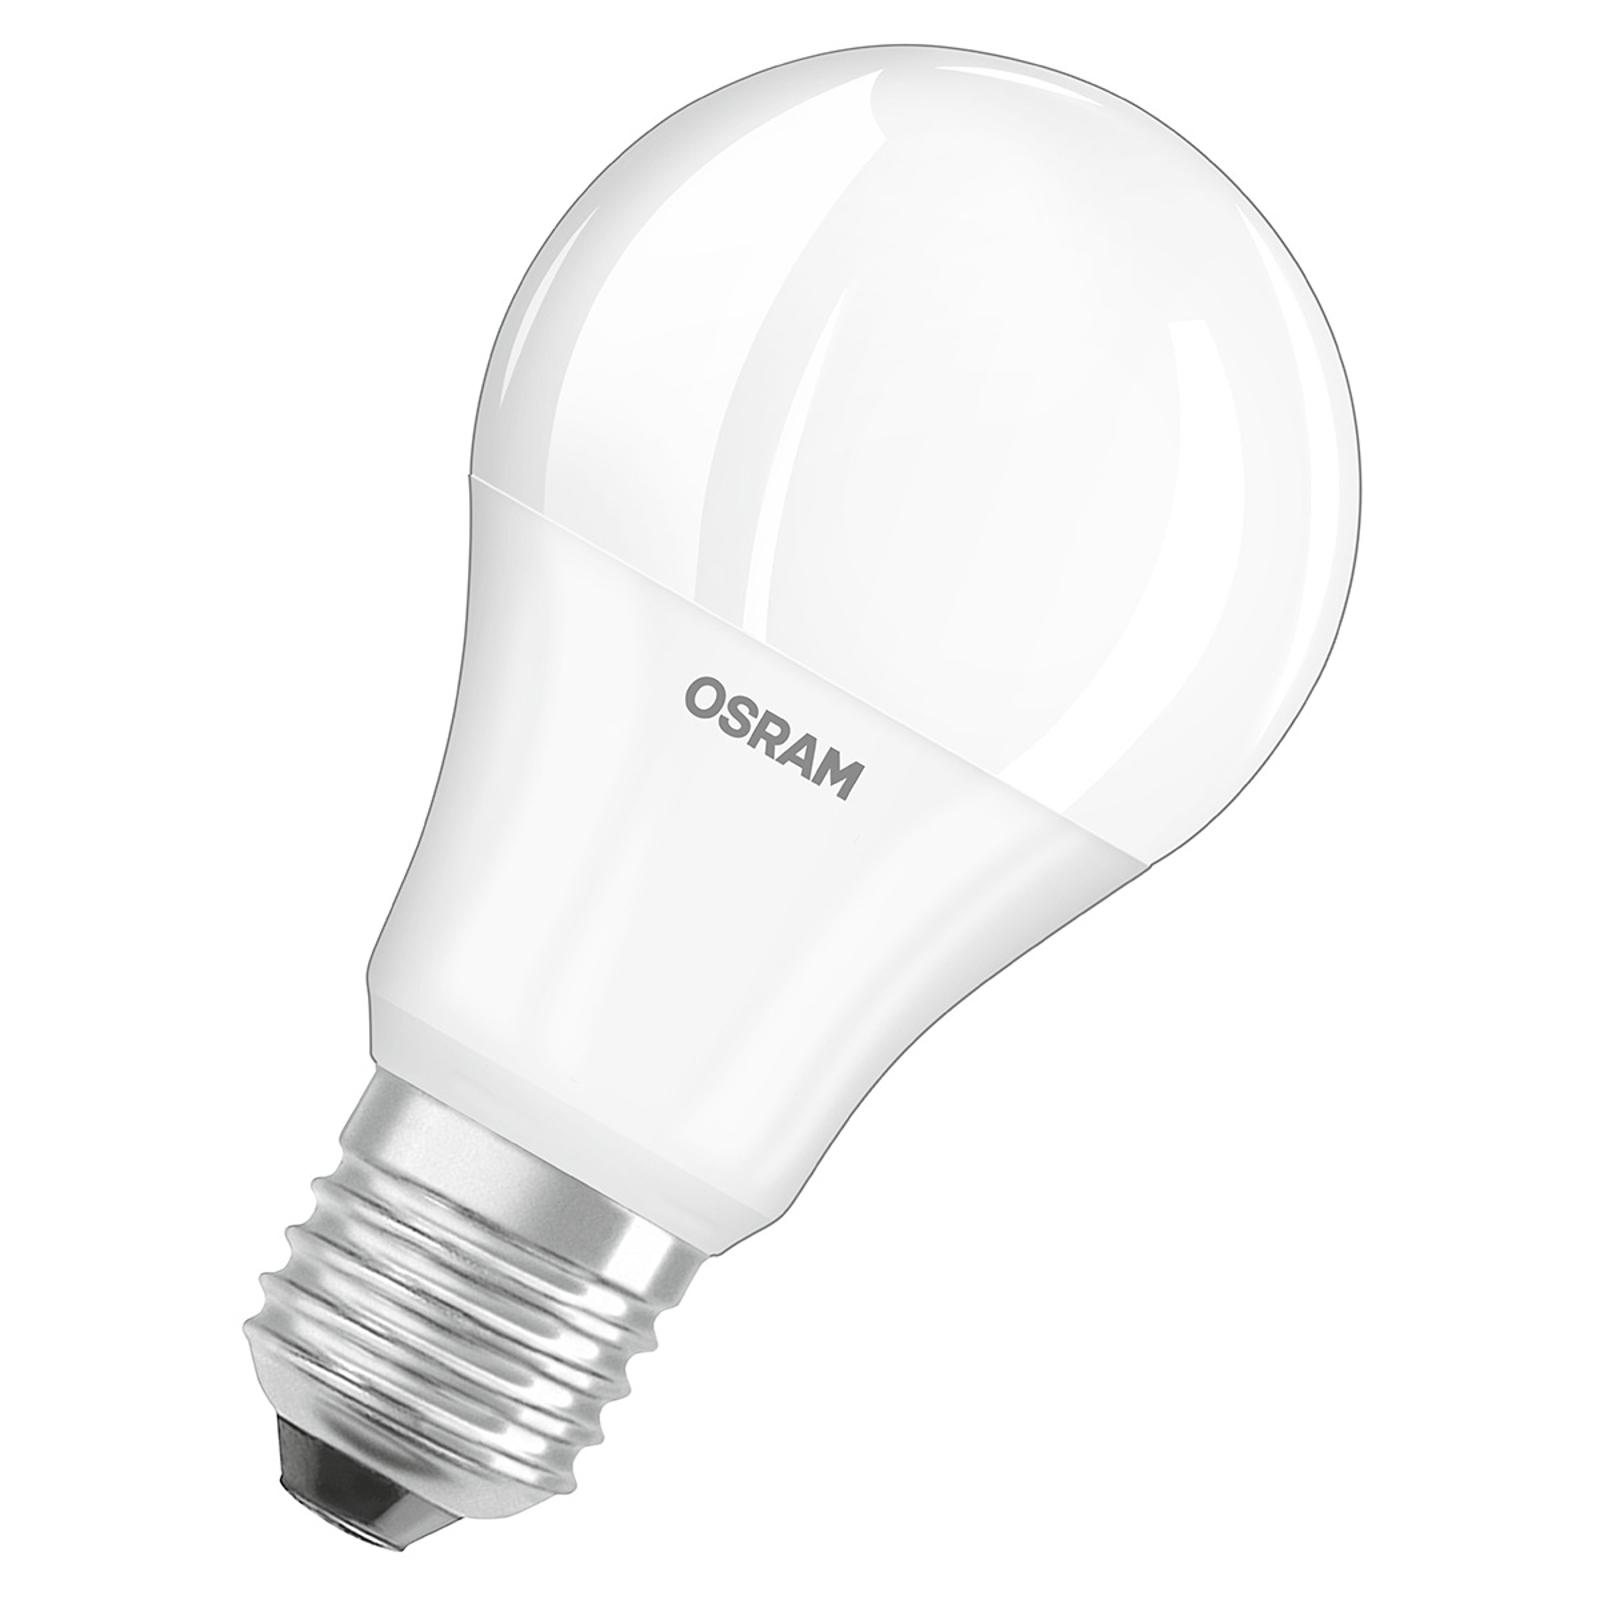 OSRAM LED-Lampe E27 10,5W 827 Superstar, dimmbar